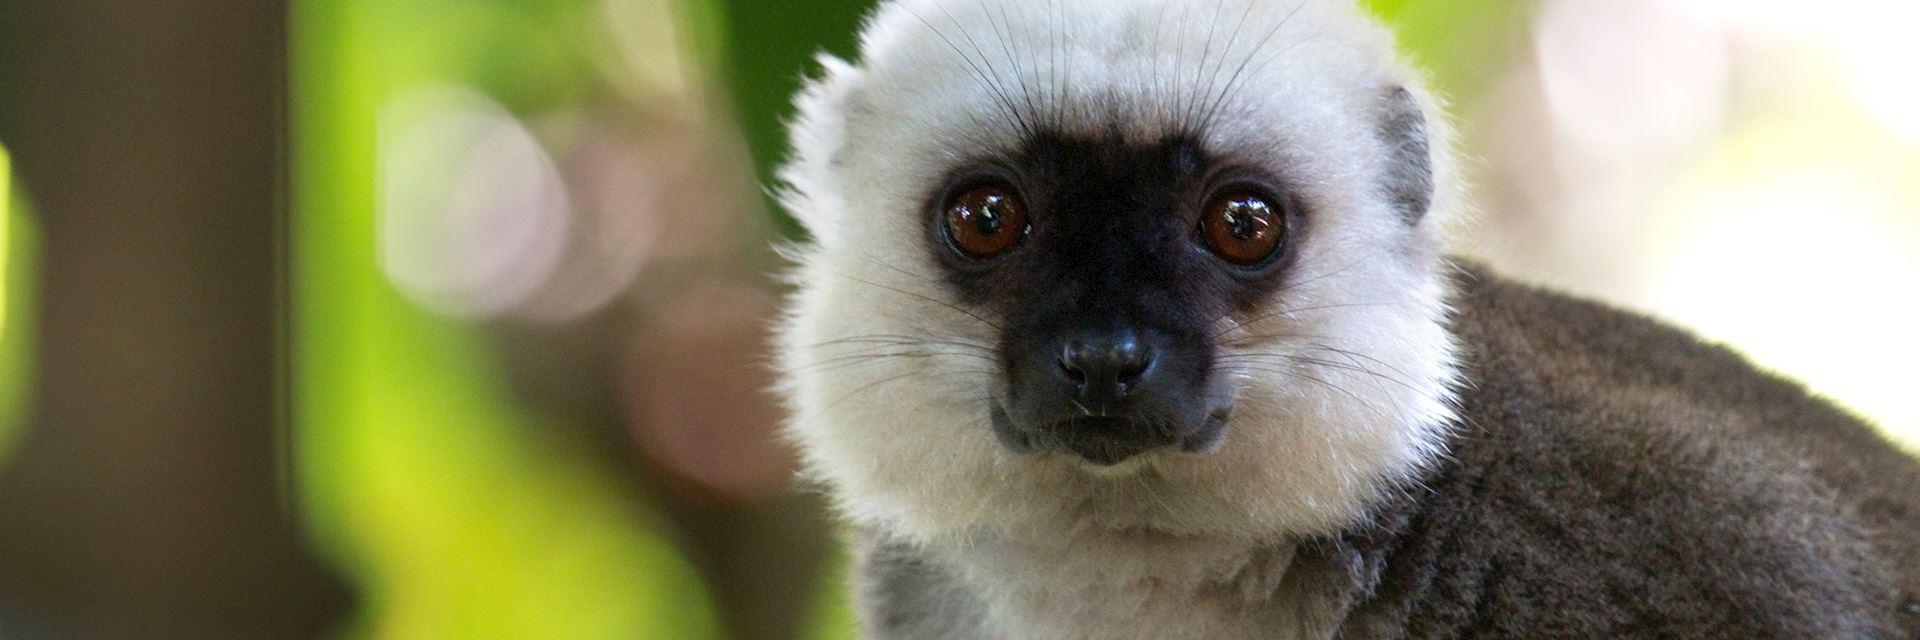 White-fronted brown lemur, Nosy Mangabe